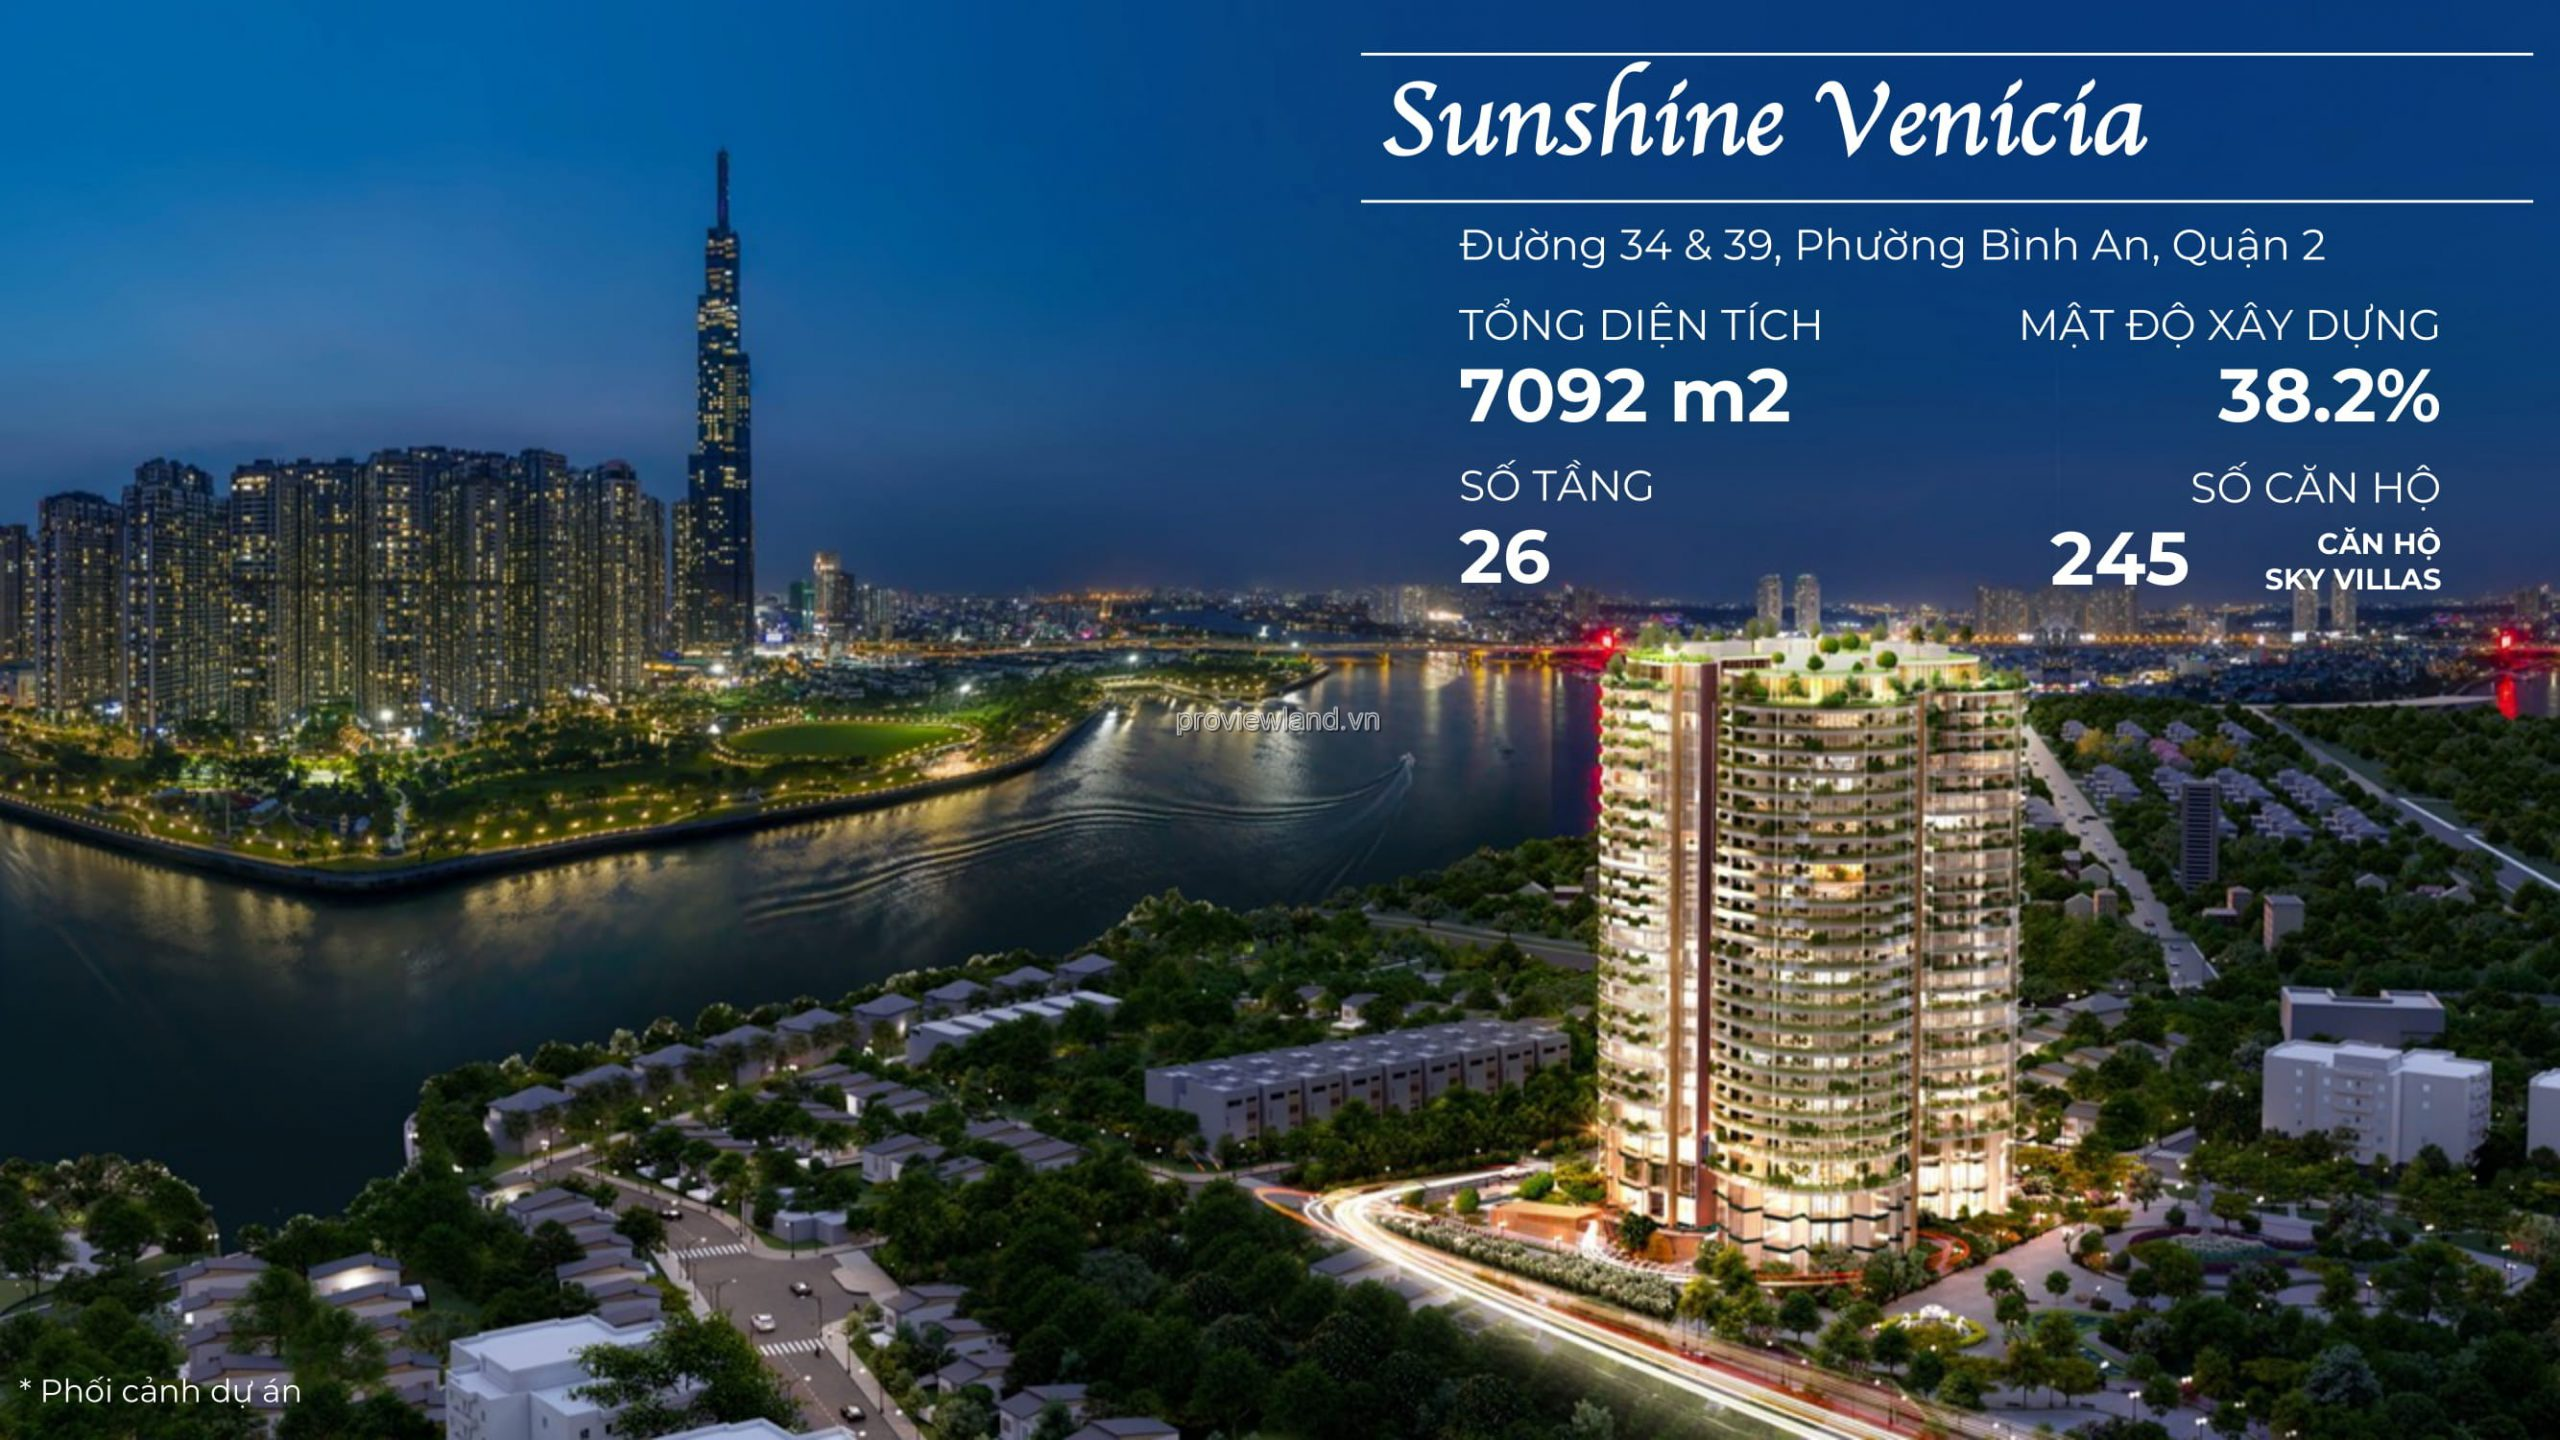 ban-can-ho-sunshine-venicia-thu-thiem-3620